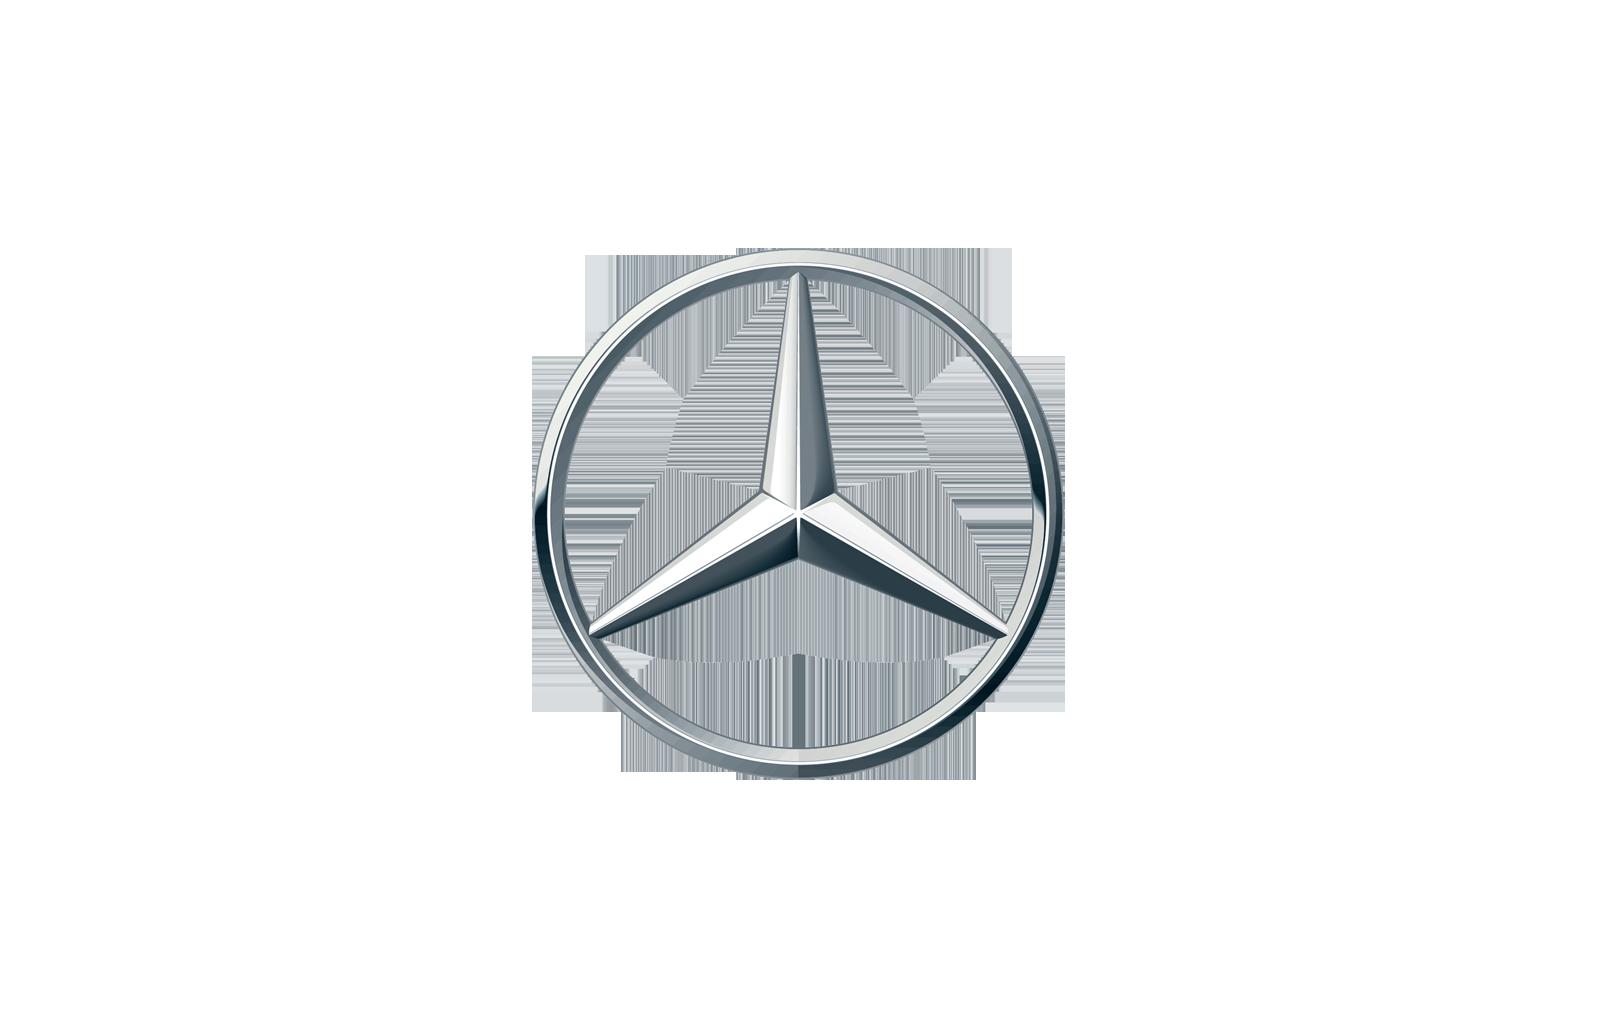 Mercedes logos PNG images free download.